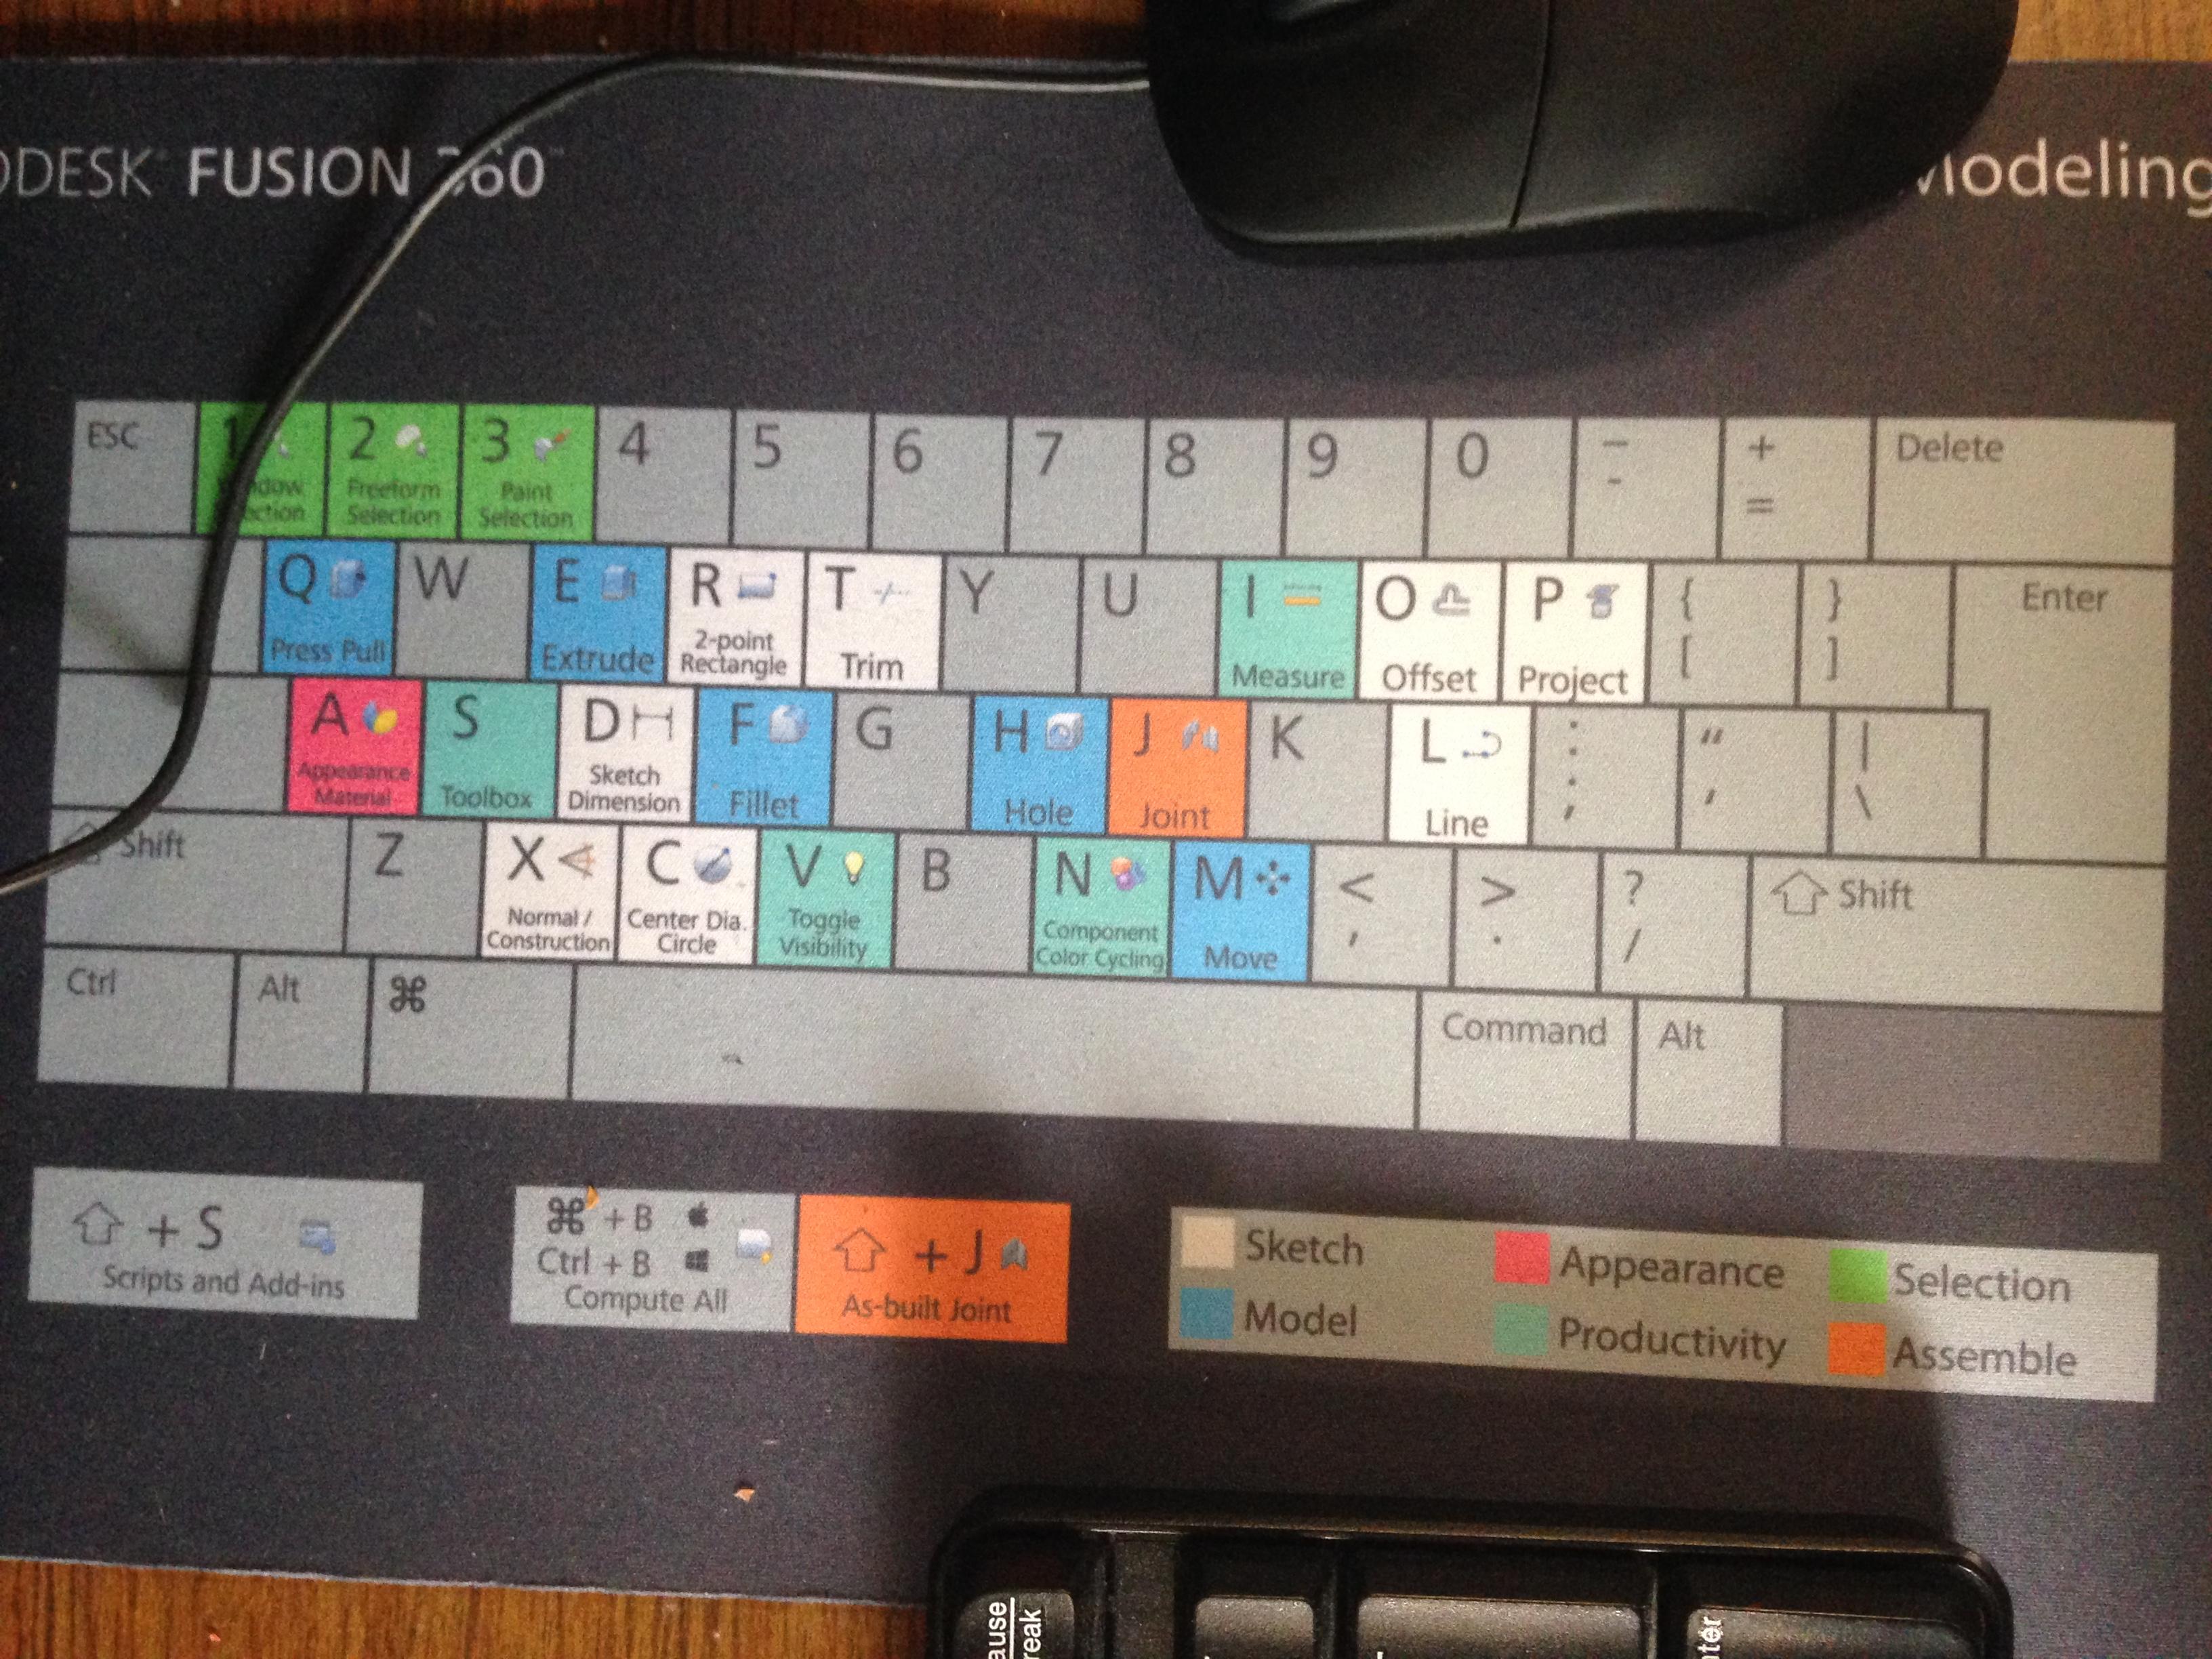 Symbols list or cheat sheet - Autodesk Community- Fusion 360